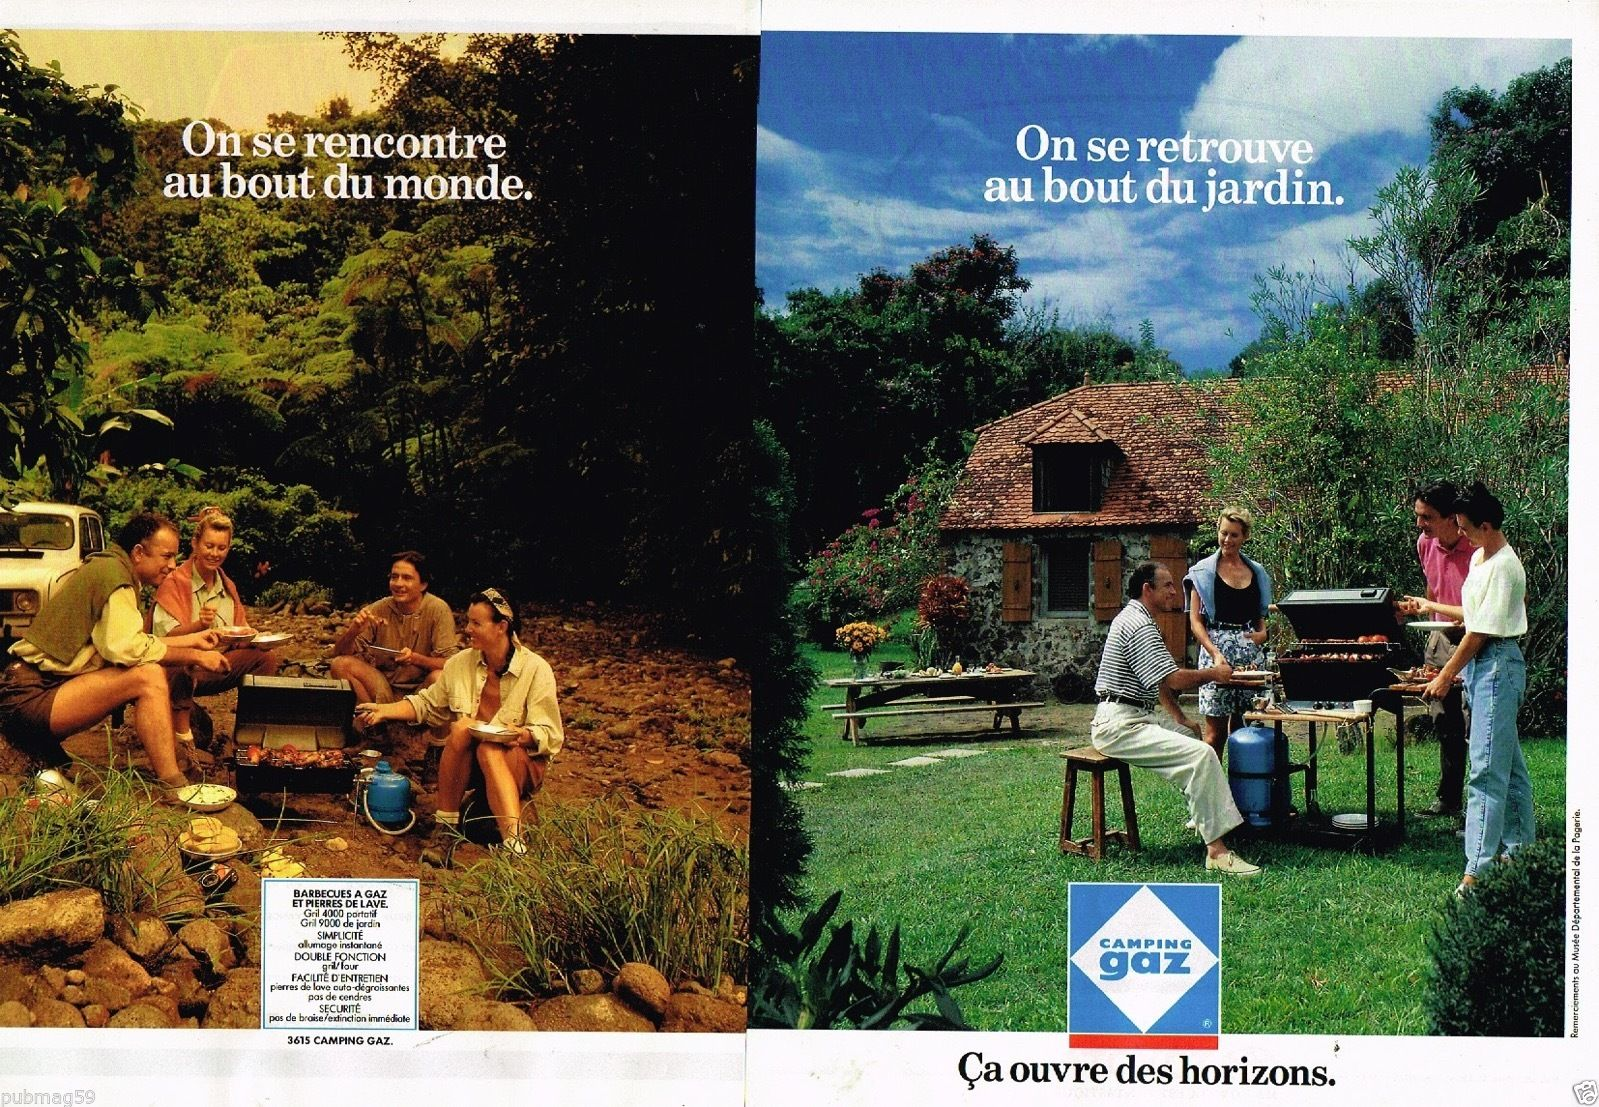 1991 Camping gaz